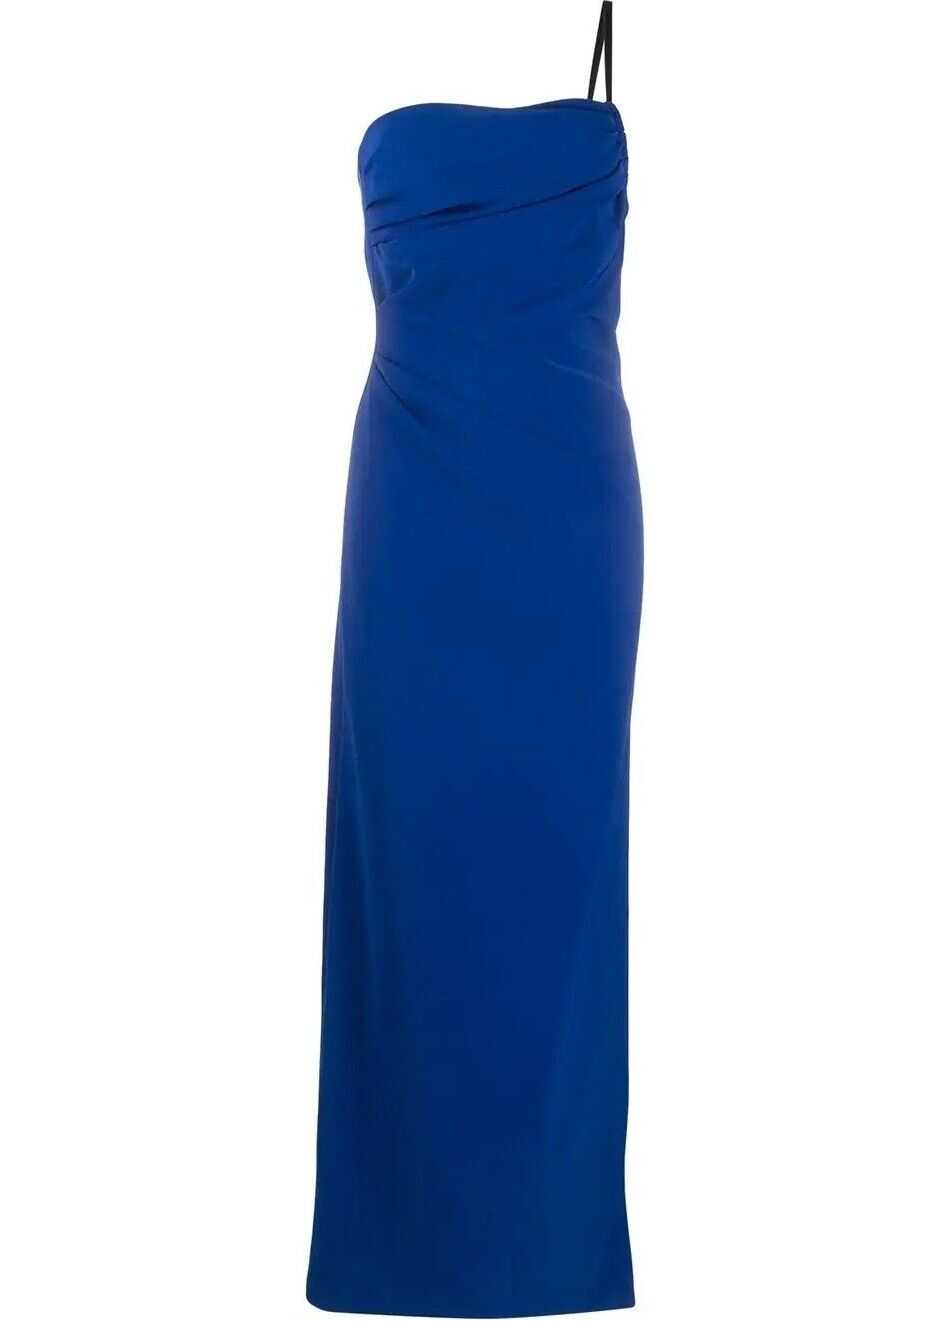 LOVE Moschino Polyester Dress BLUE